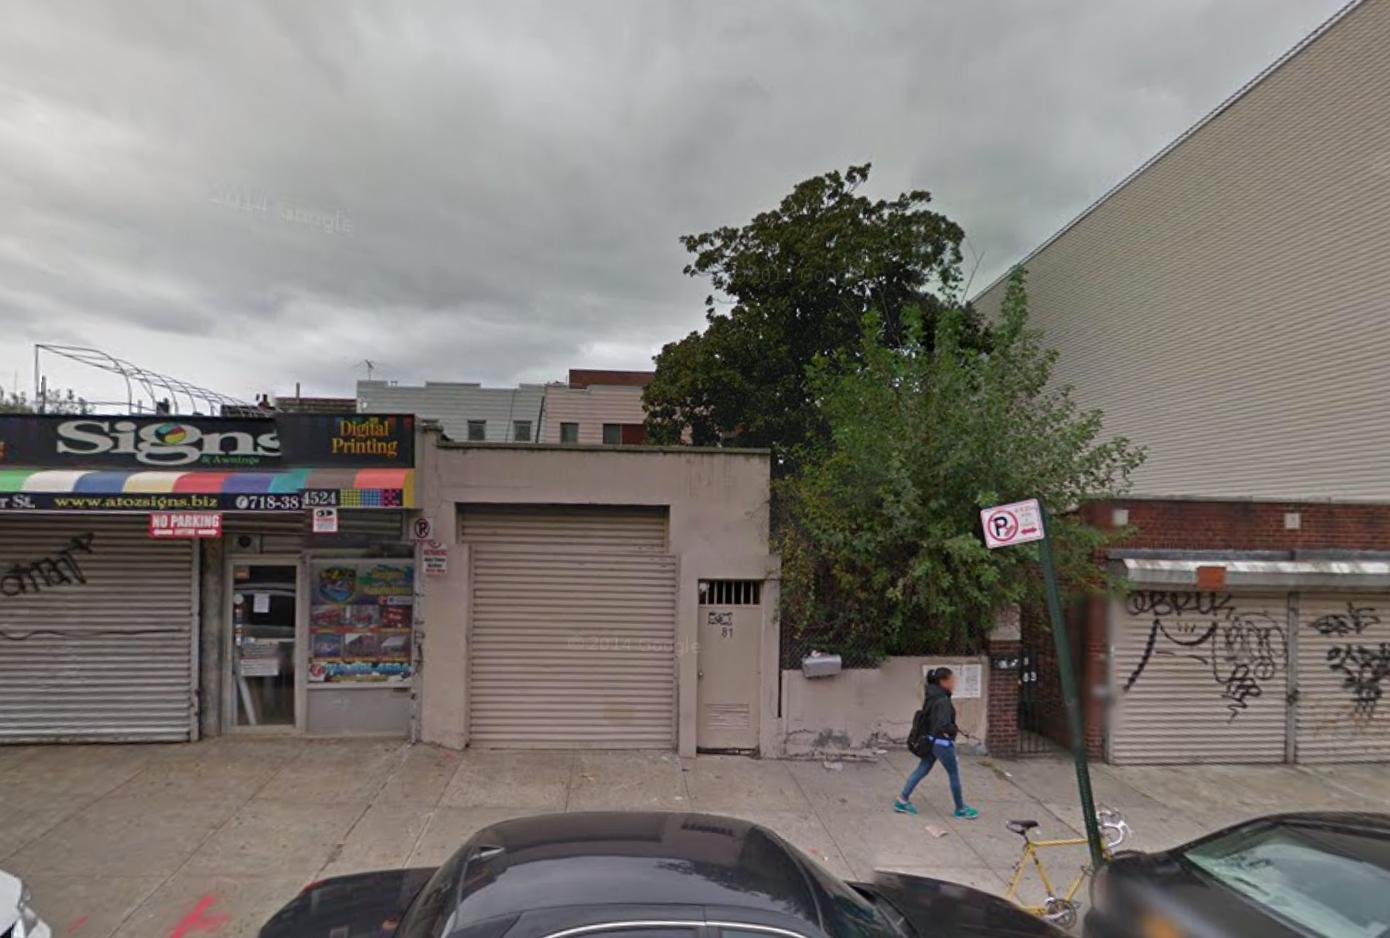 81 Starr Street